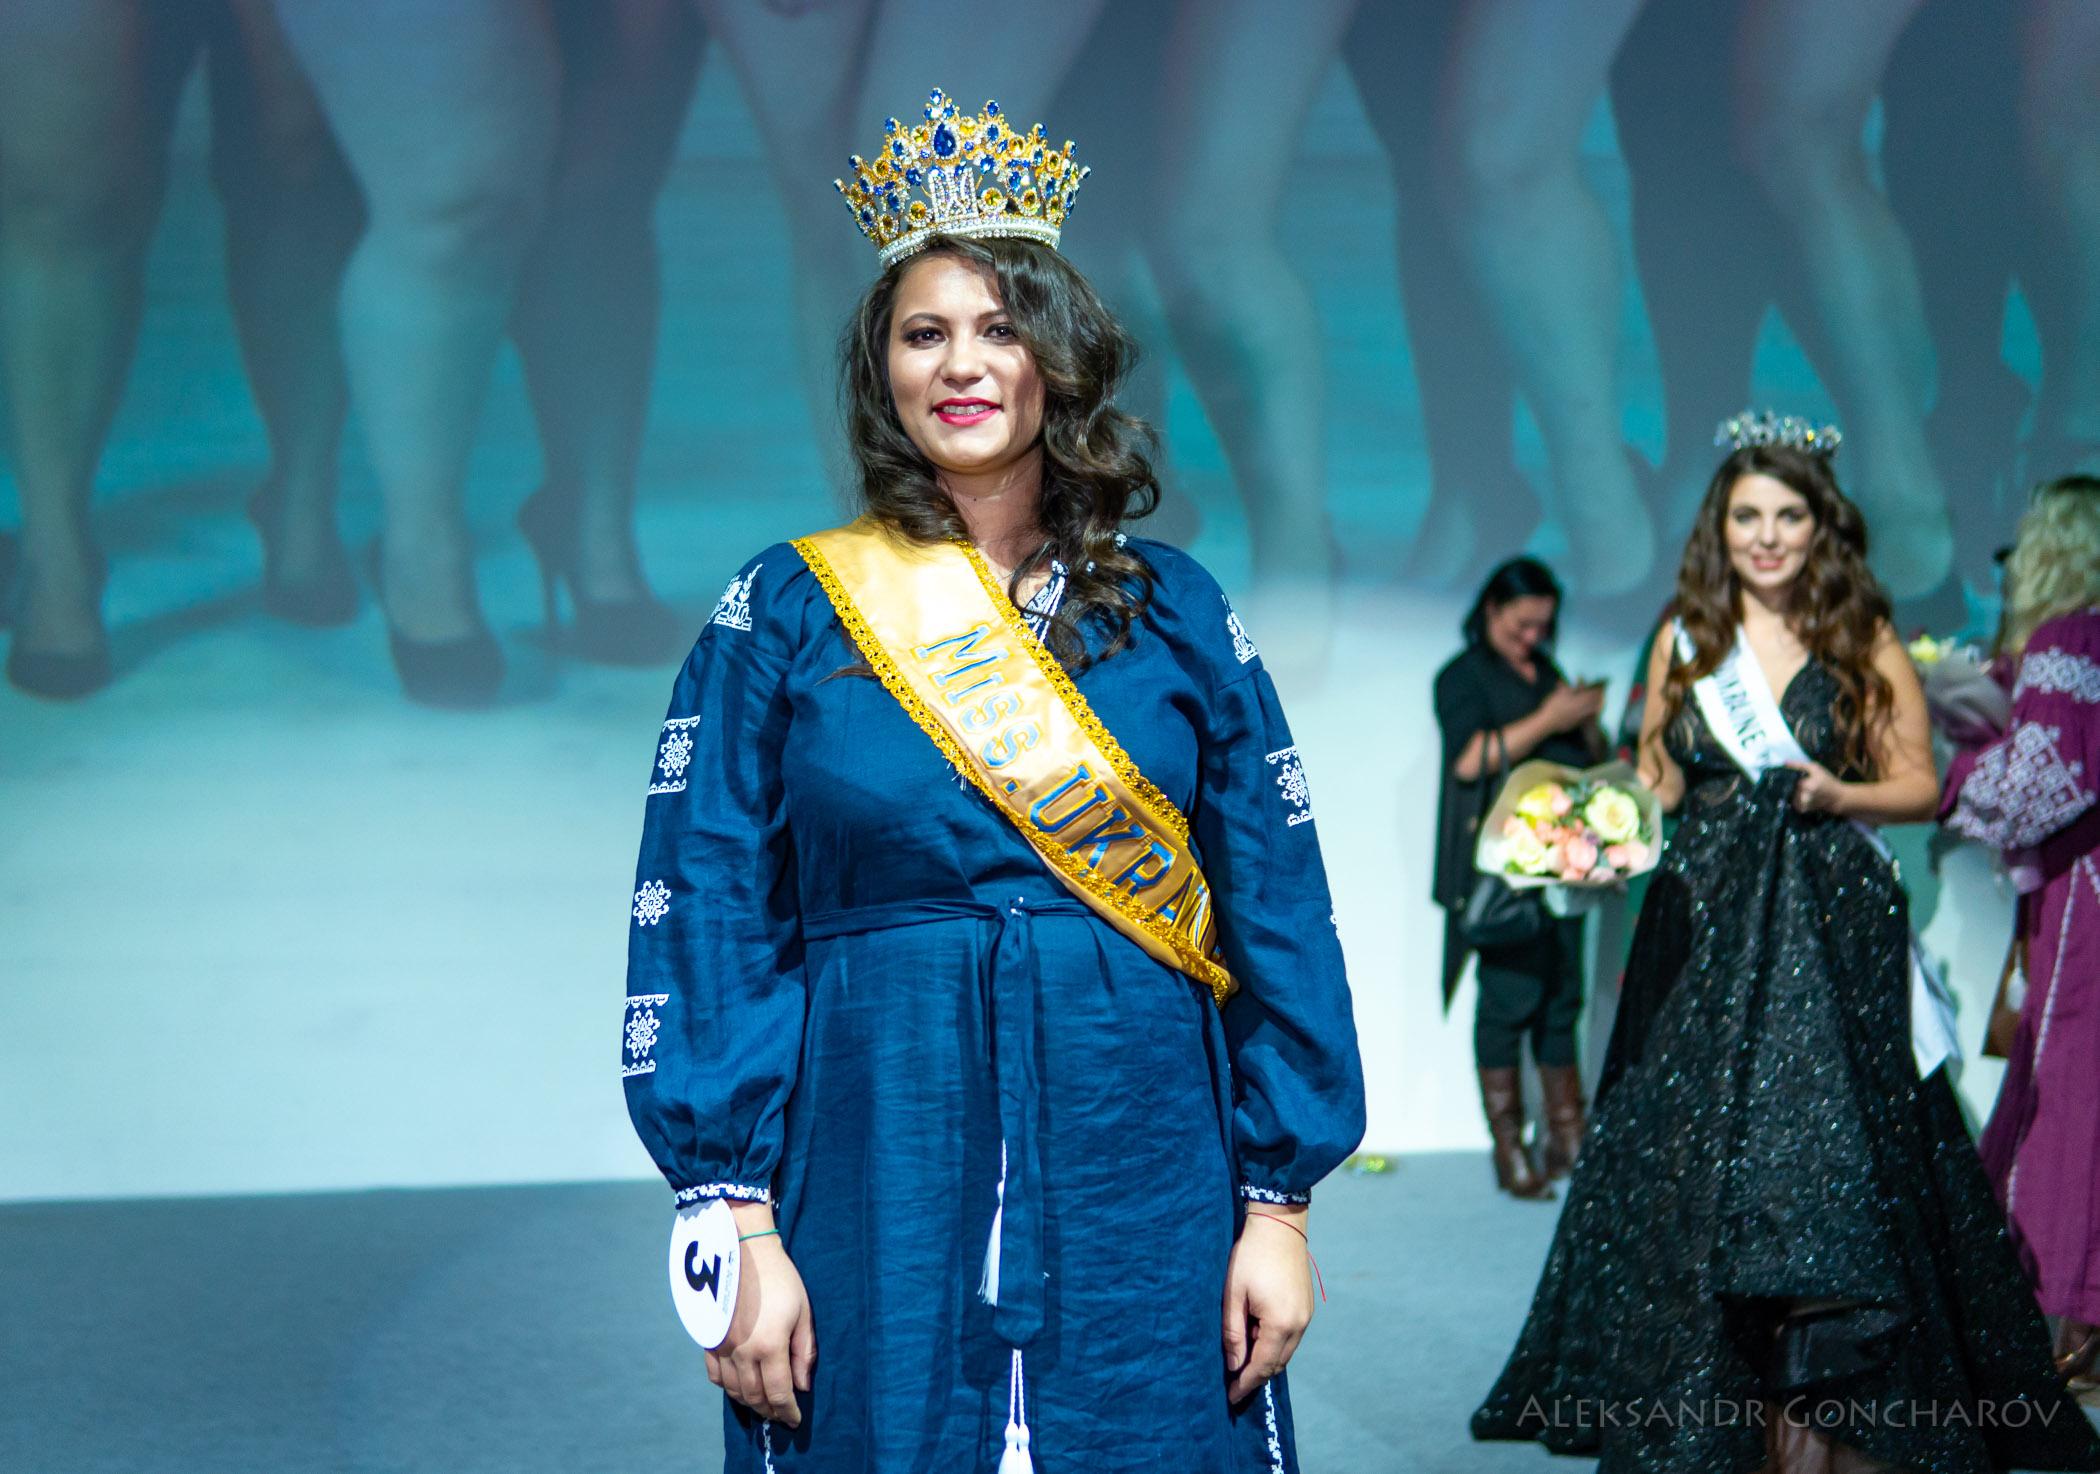 Корону «Мисс Украина Plus Size» Наталье Пащенко (по паспорту Кудренко) вручили ошибочно